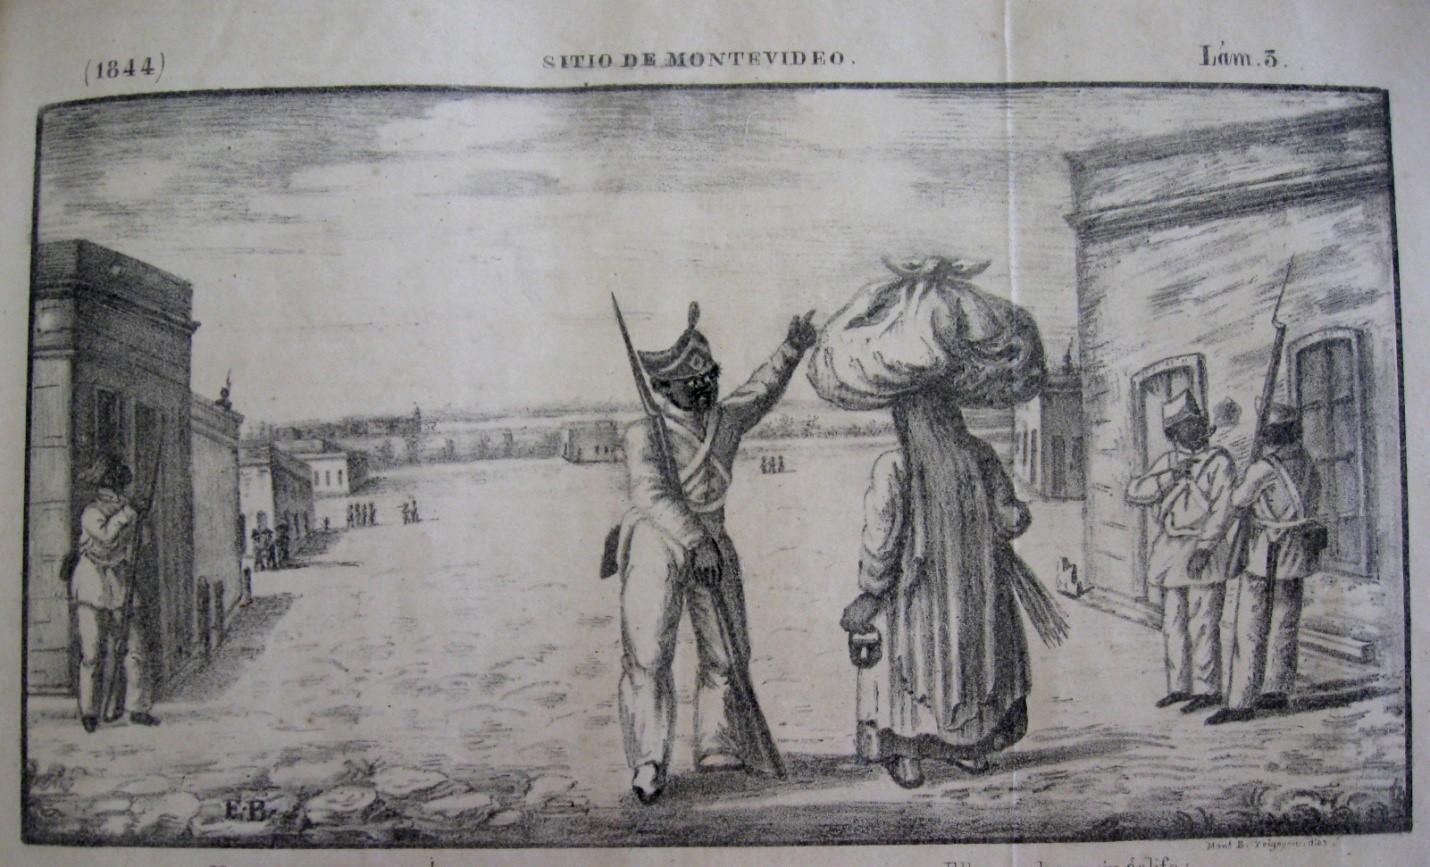 El Telegrafo de Linea, Montevideo, December 8, 1844